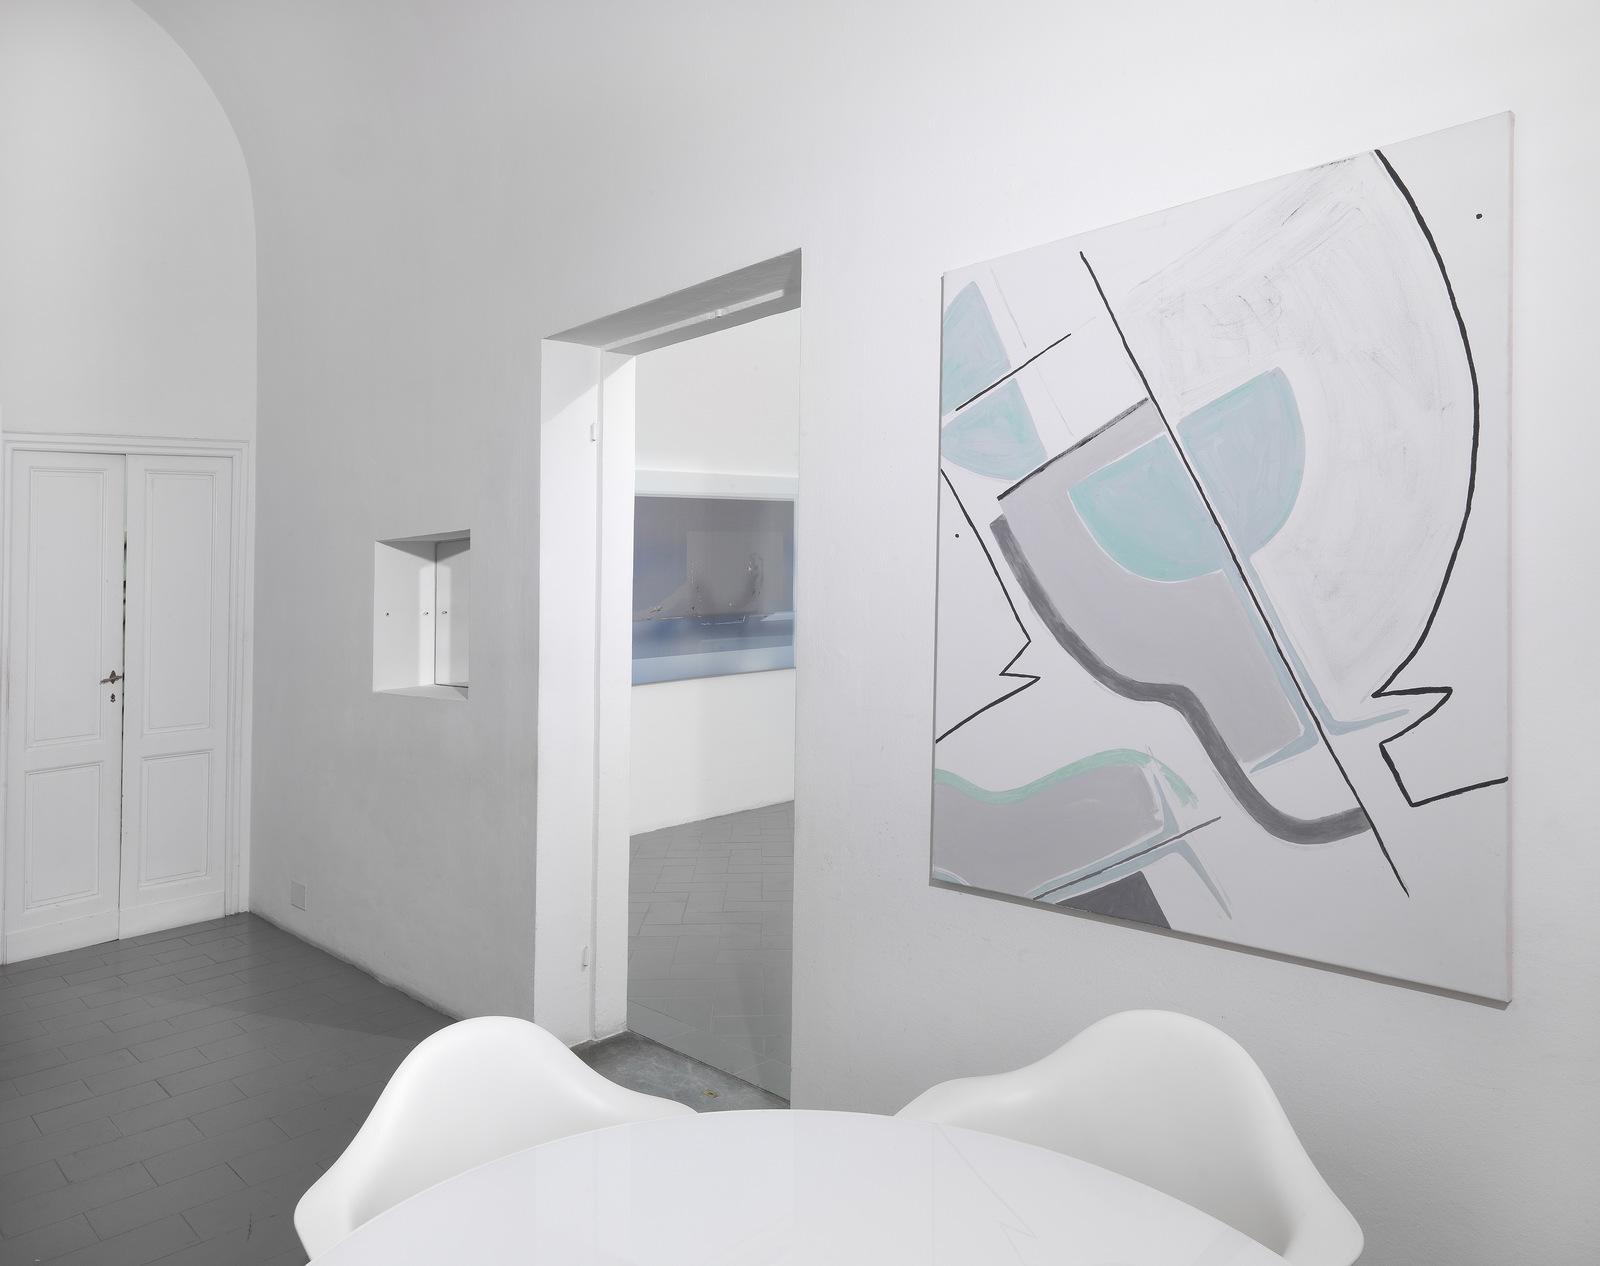 9.Installation View. Joshua Citarella, Zoe de Soumagnat. Courtesy of Eduardo Secci Contemporary